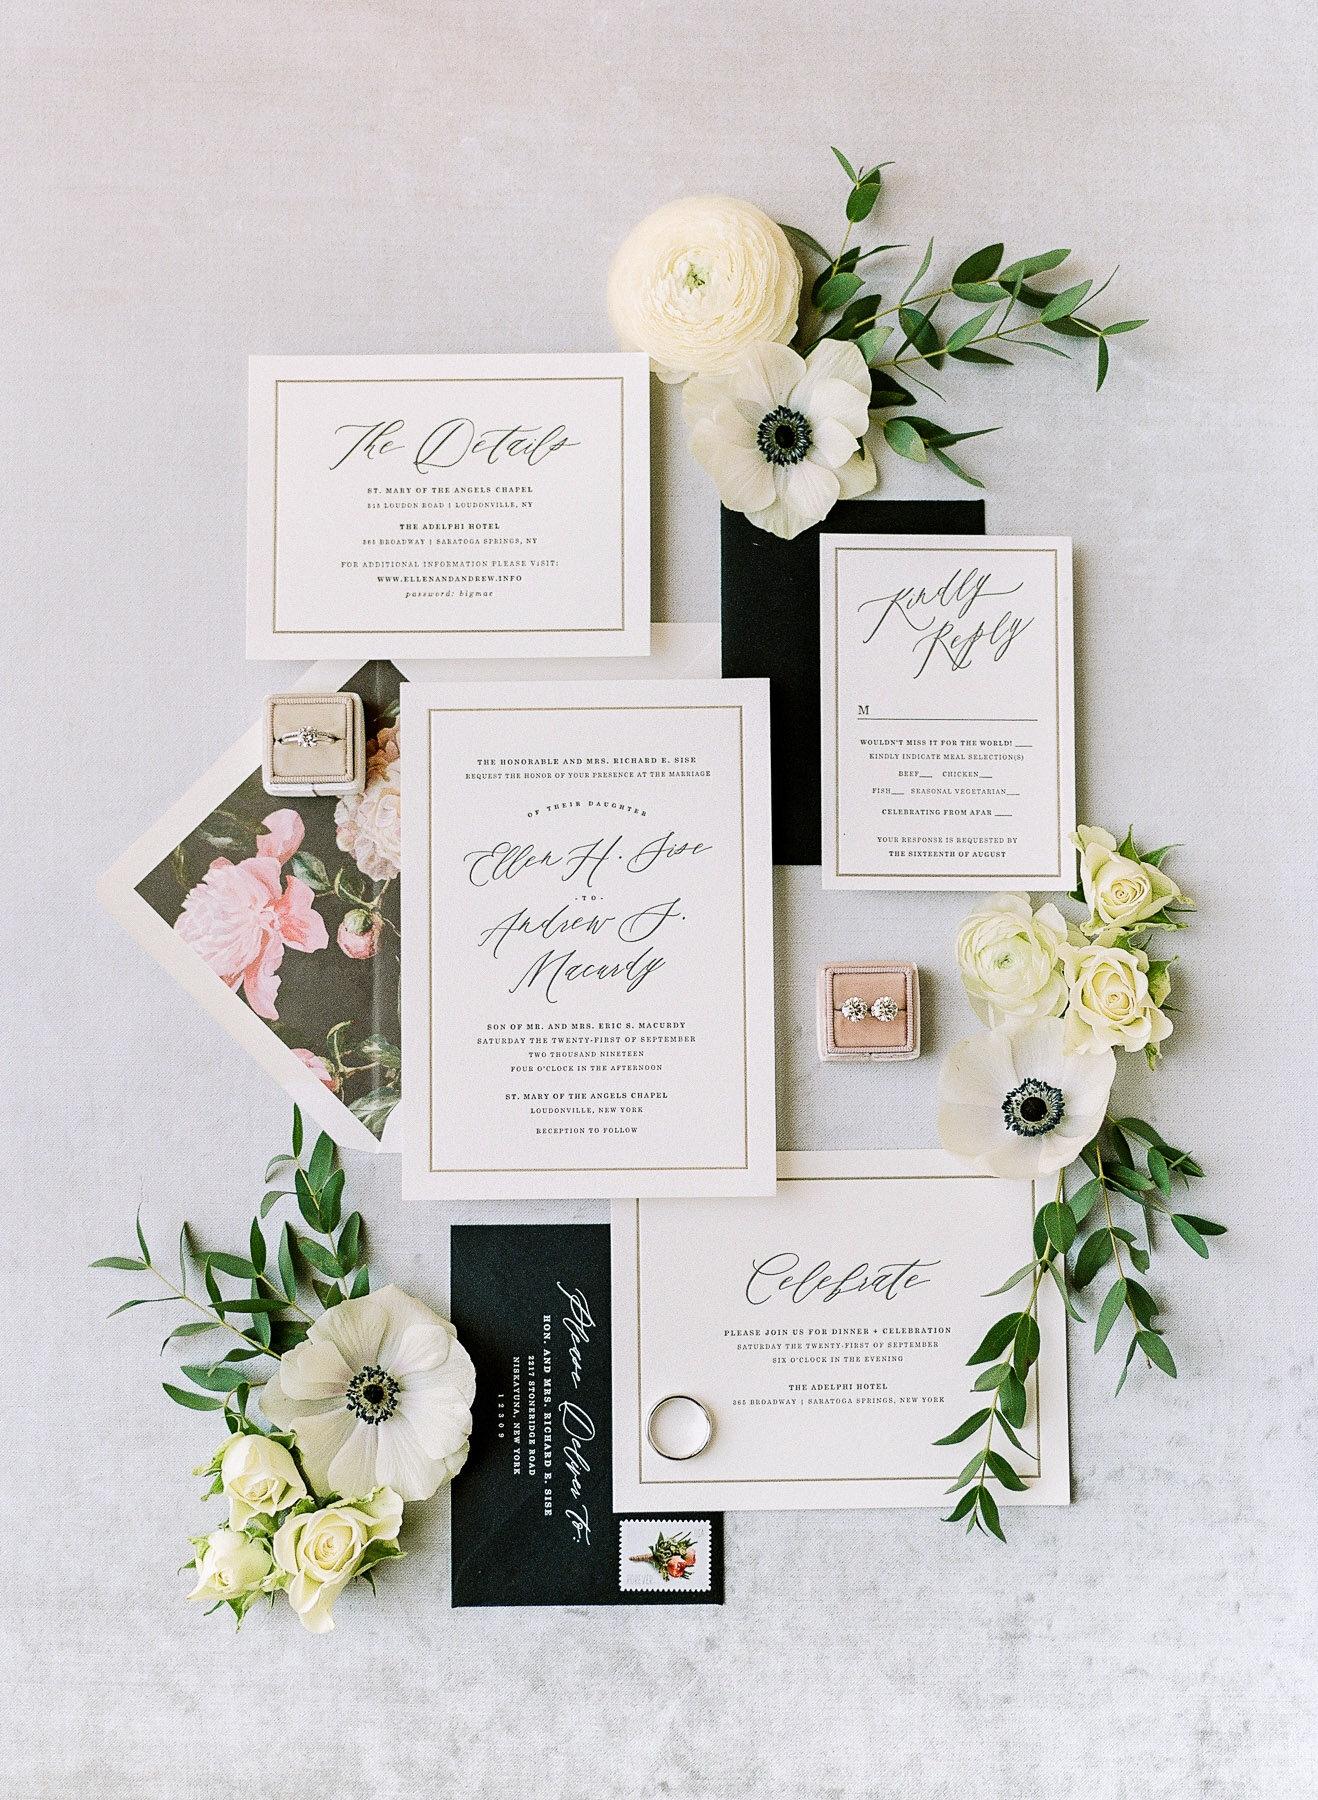 Darling and Pearl Wedding Invitation